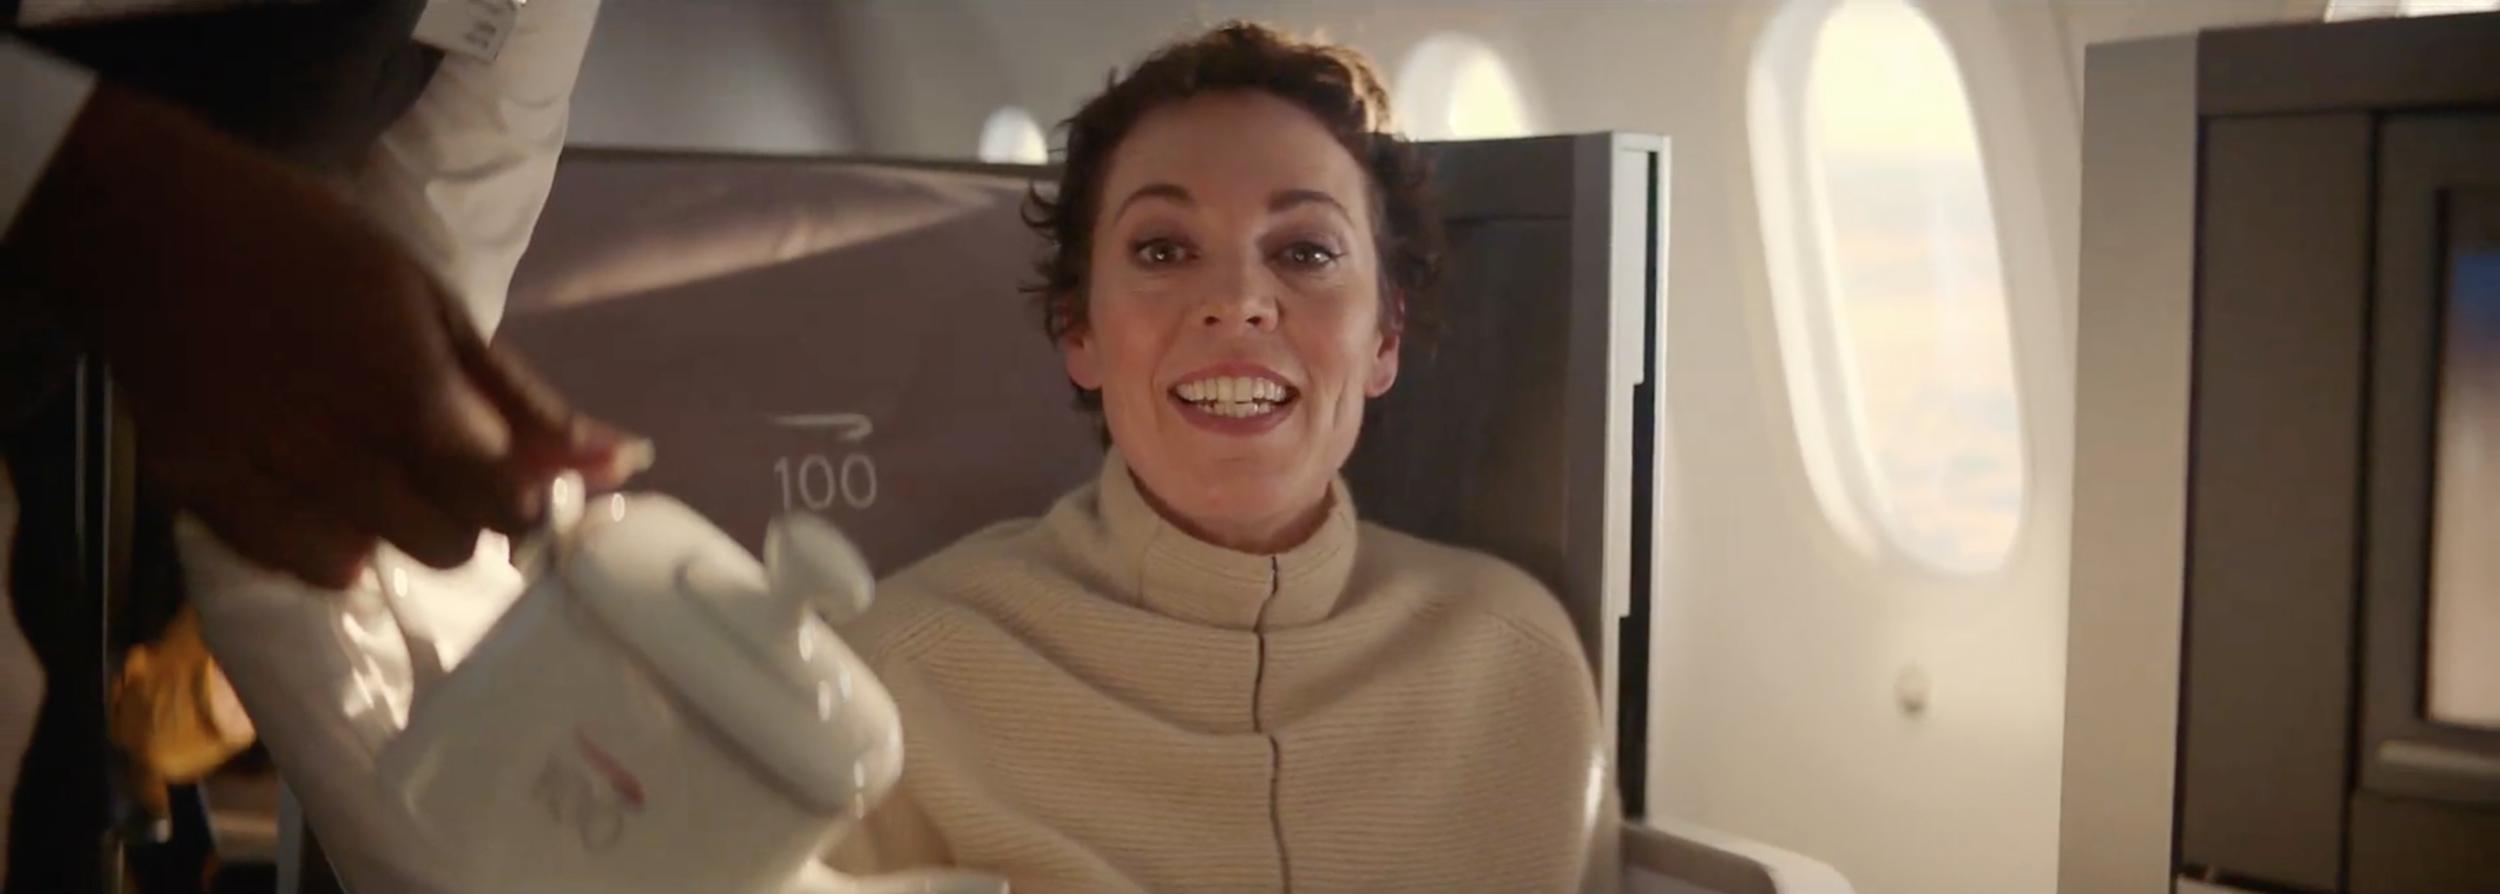 British Airways / Director Tom Tagholm - Creative Researcher Jody Elizabeth Nolan